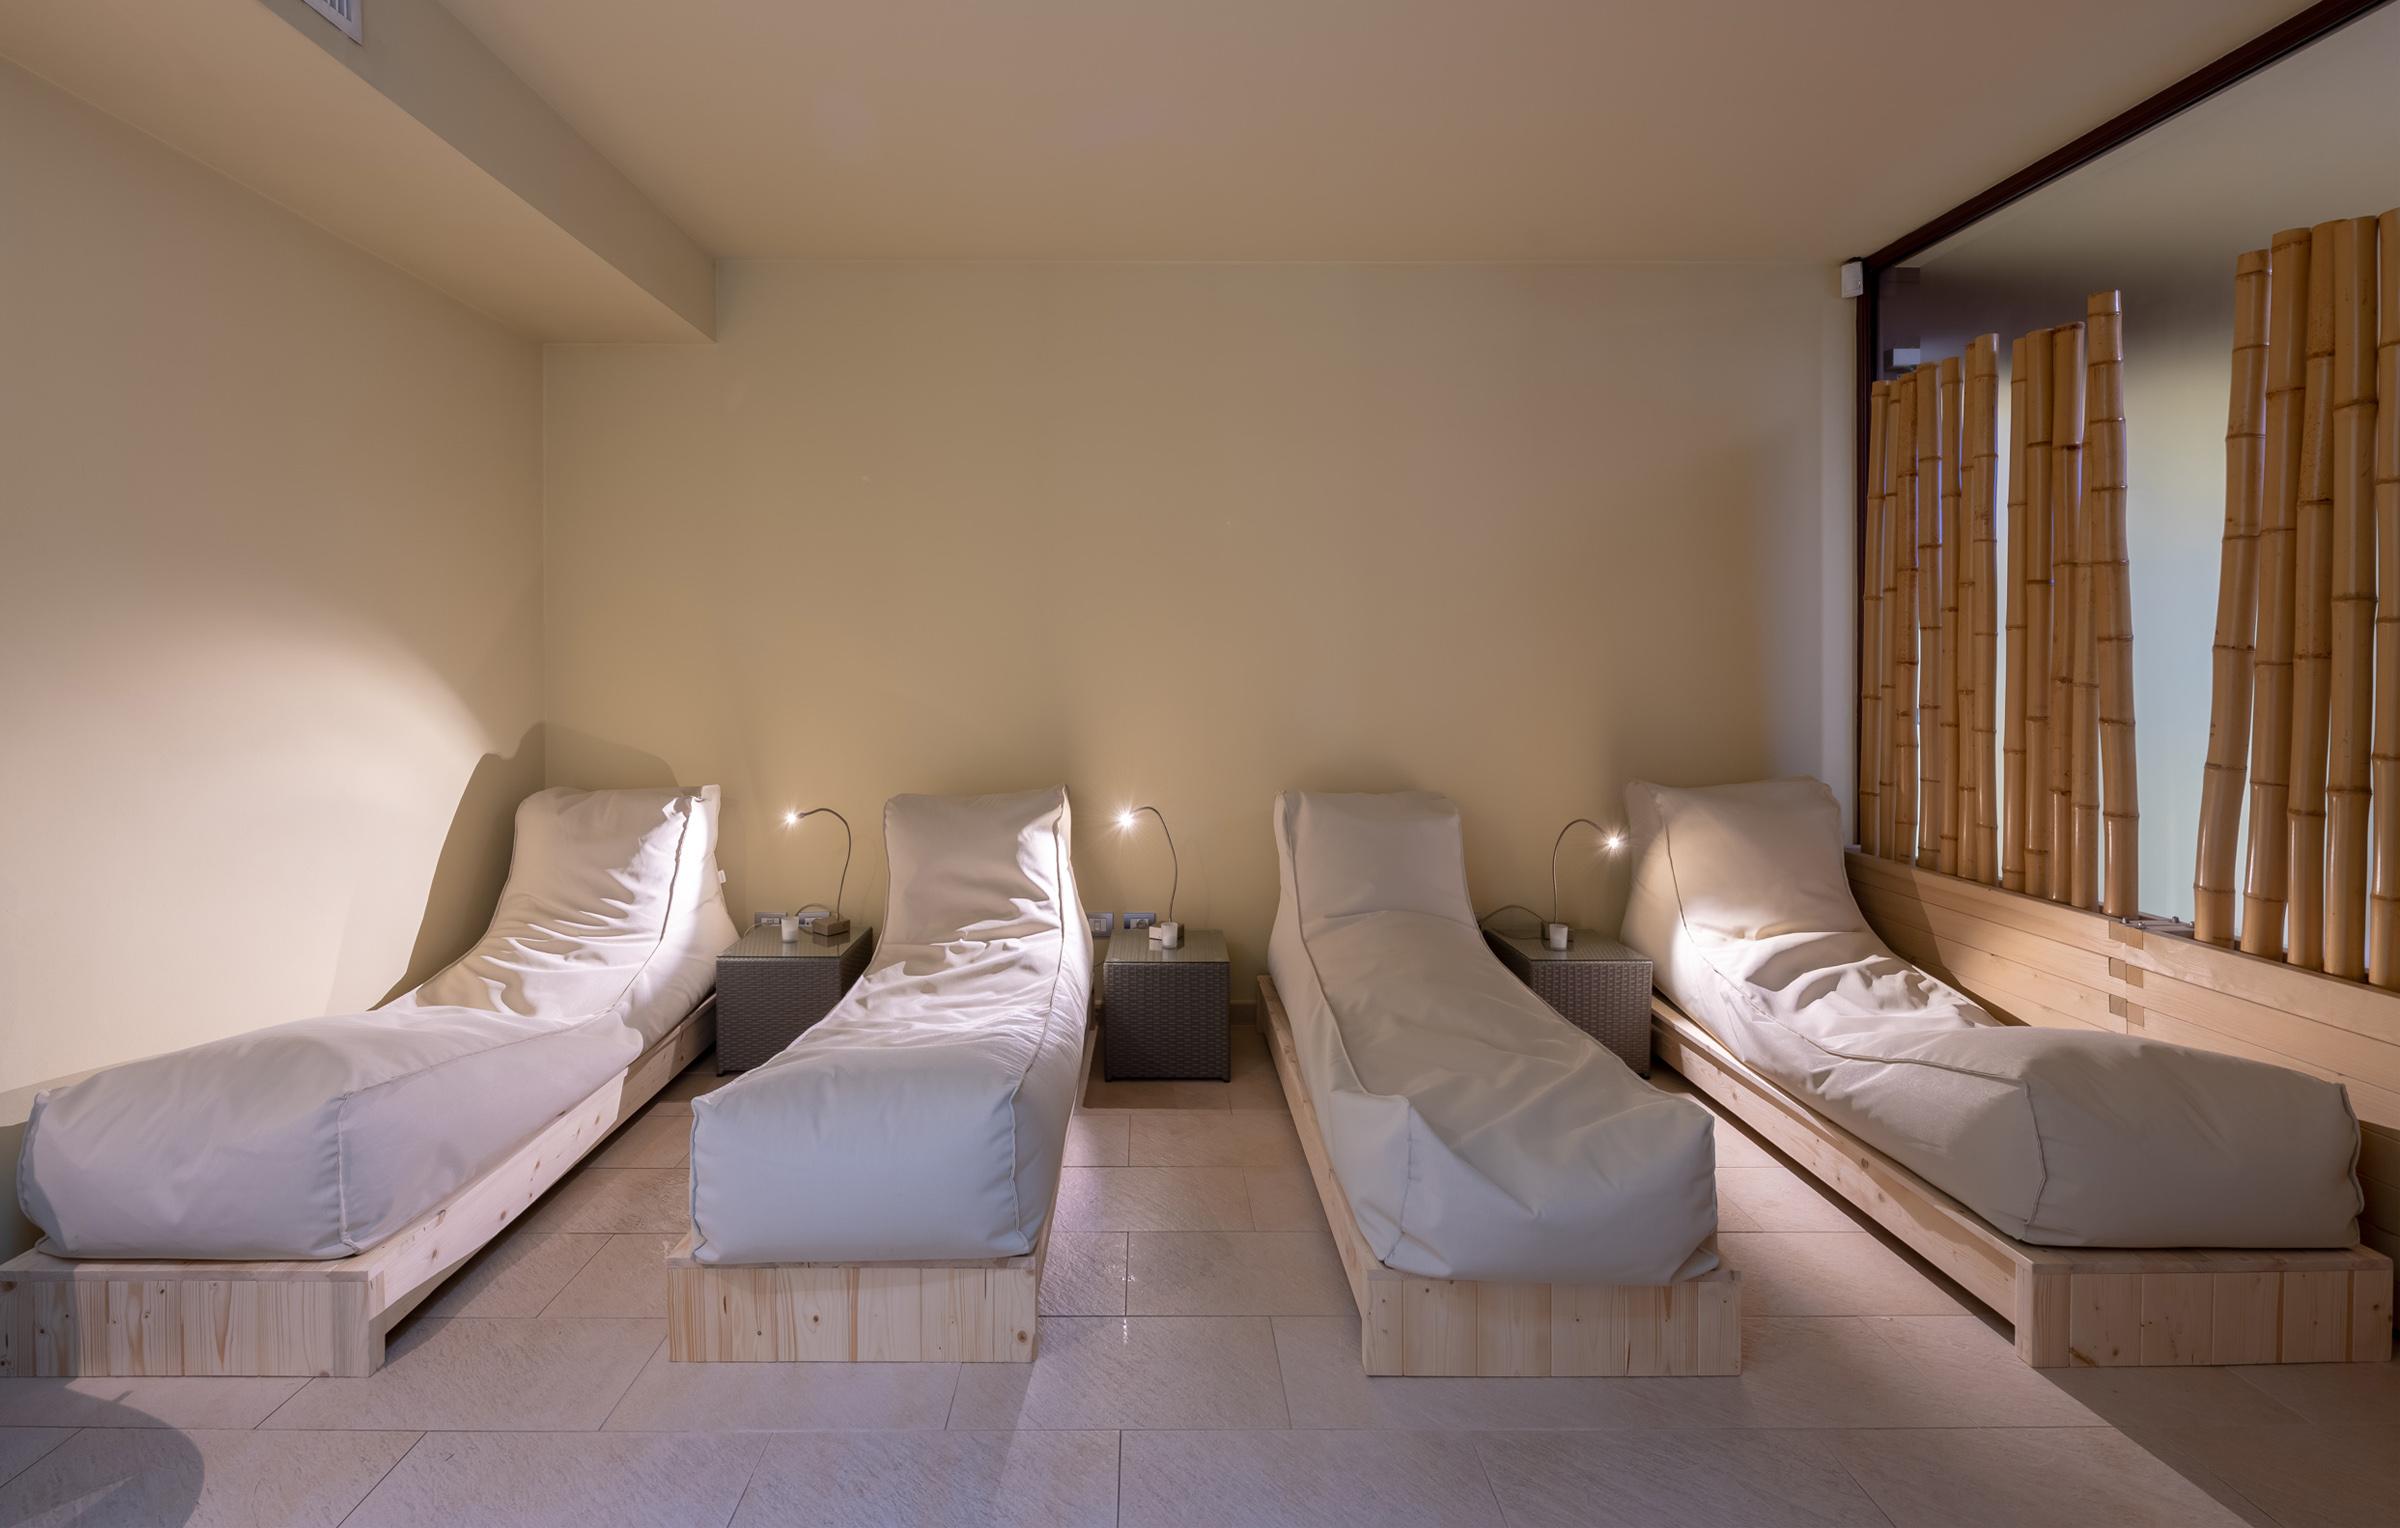 zona relax con tisaneria